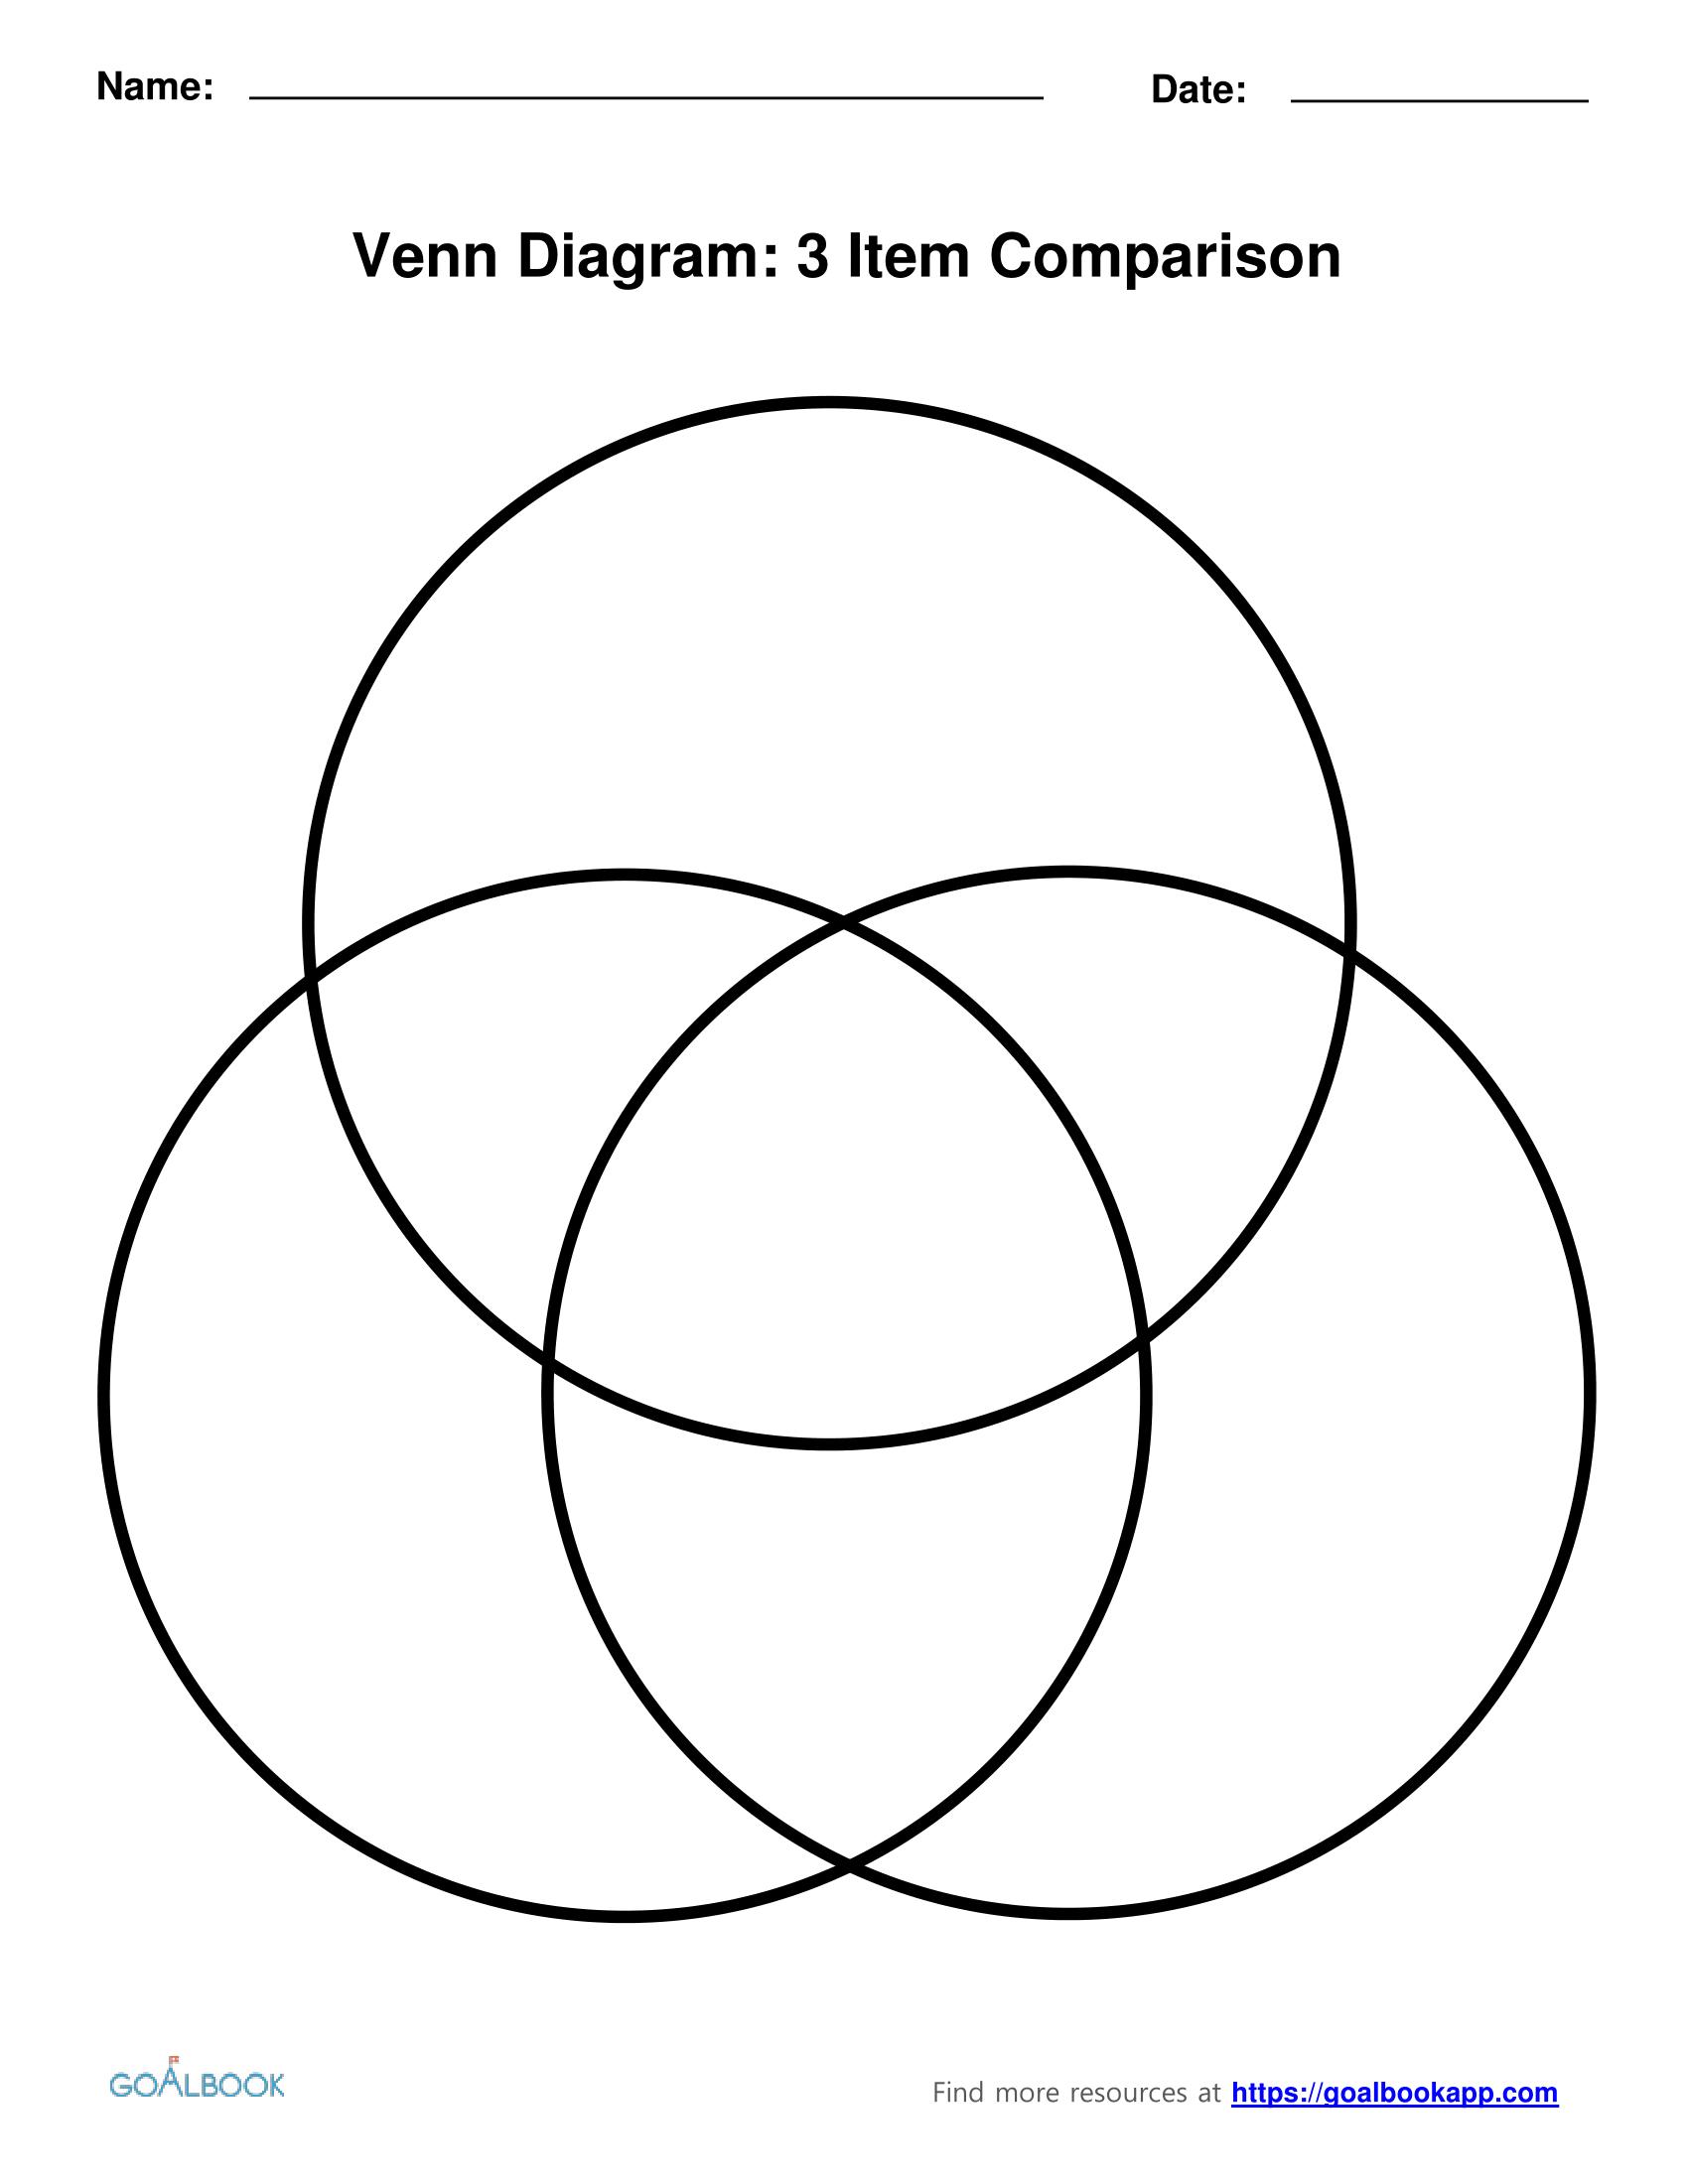 What Is A Venn Diagram Venn Diagram Udl Strategies Goalbook Toolkit